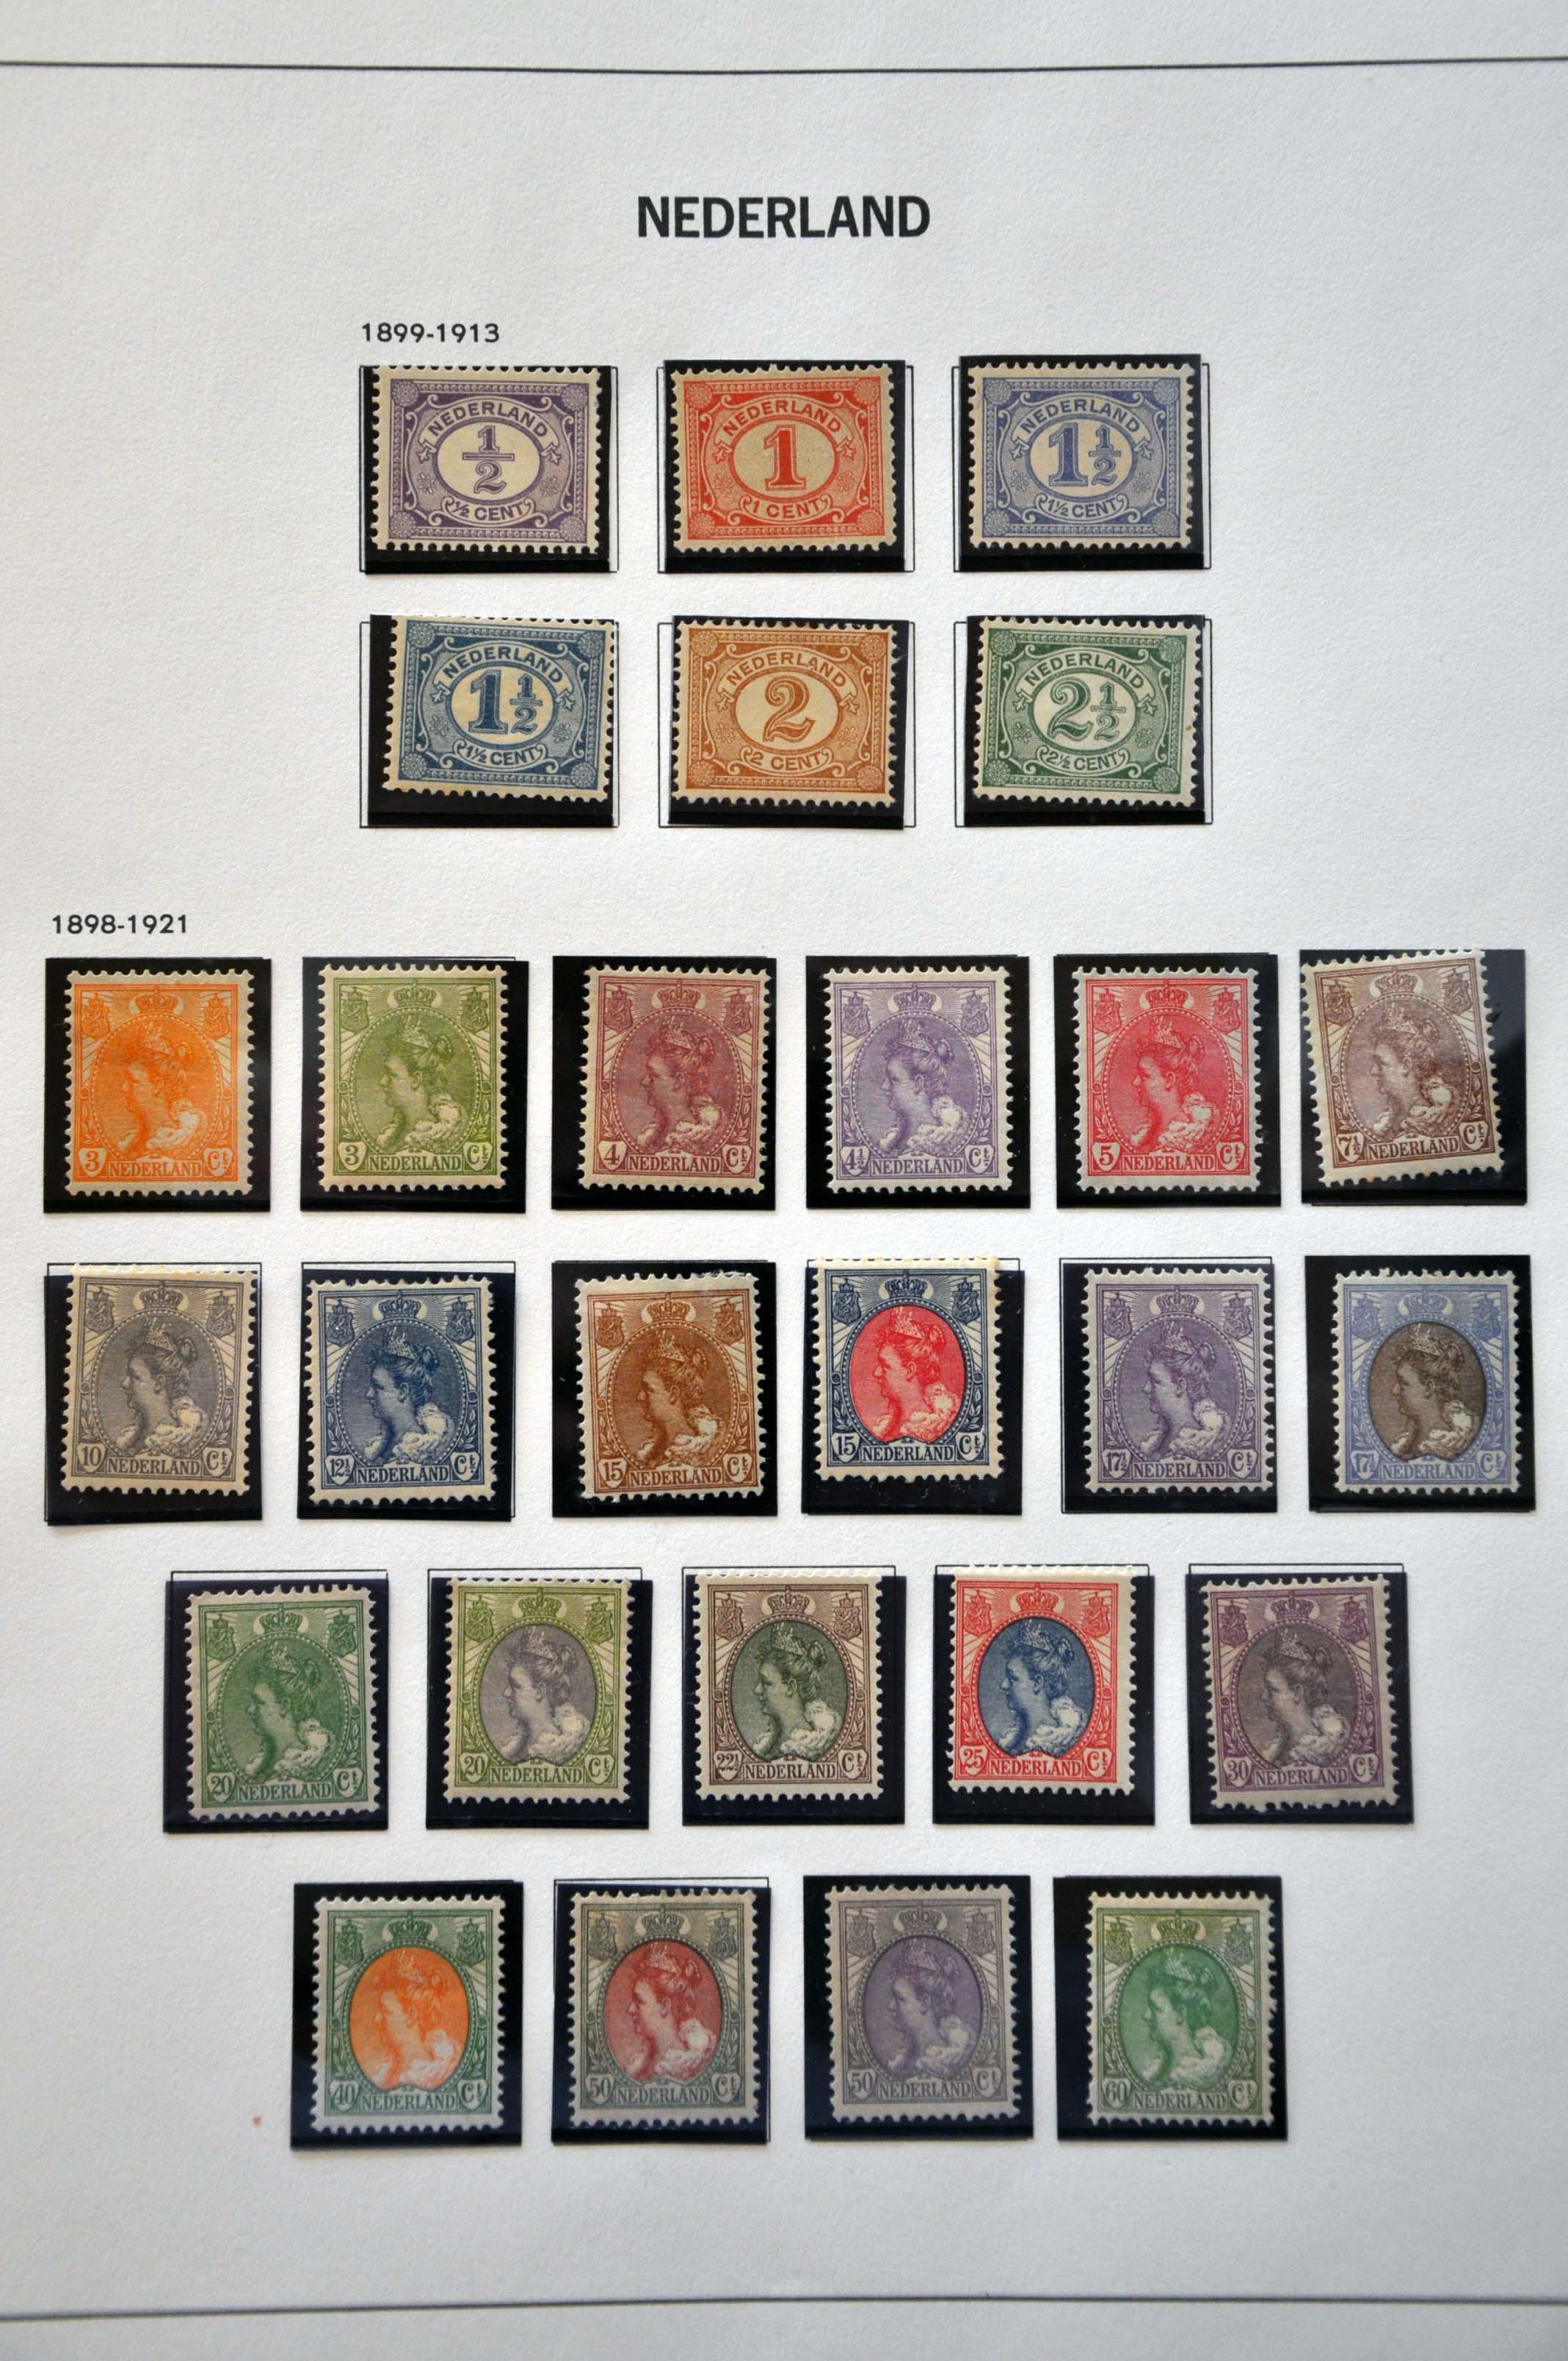 Lot 1721 - Netherlands and former colonies Netherlands -  Corinphila Veilingen Auction 242: General sale